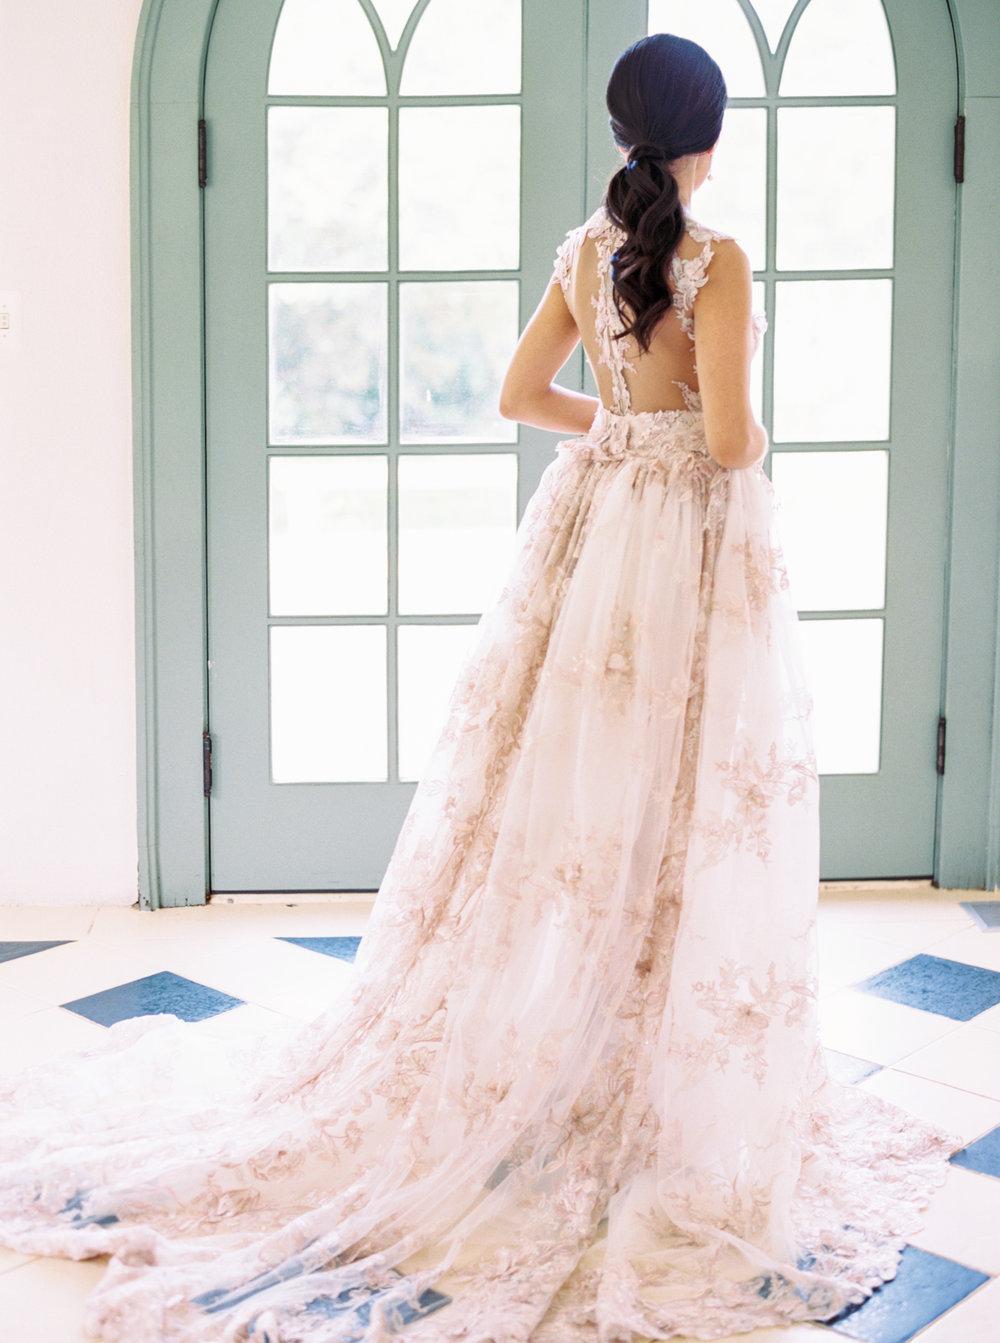 Luxury Wedding Photographer Austin-10.jpg